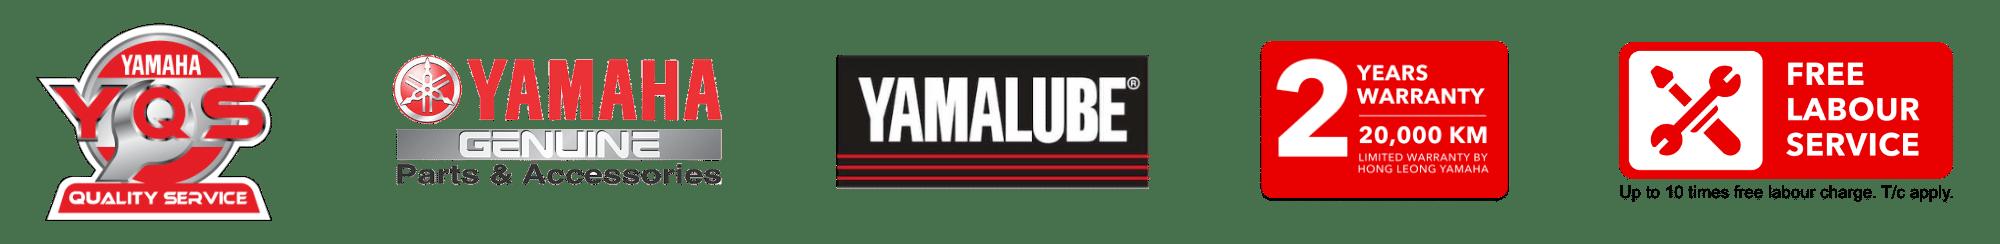 yamaha quality service factory approved service logo